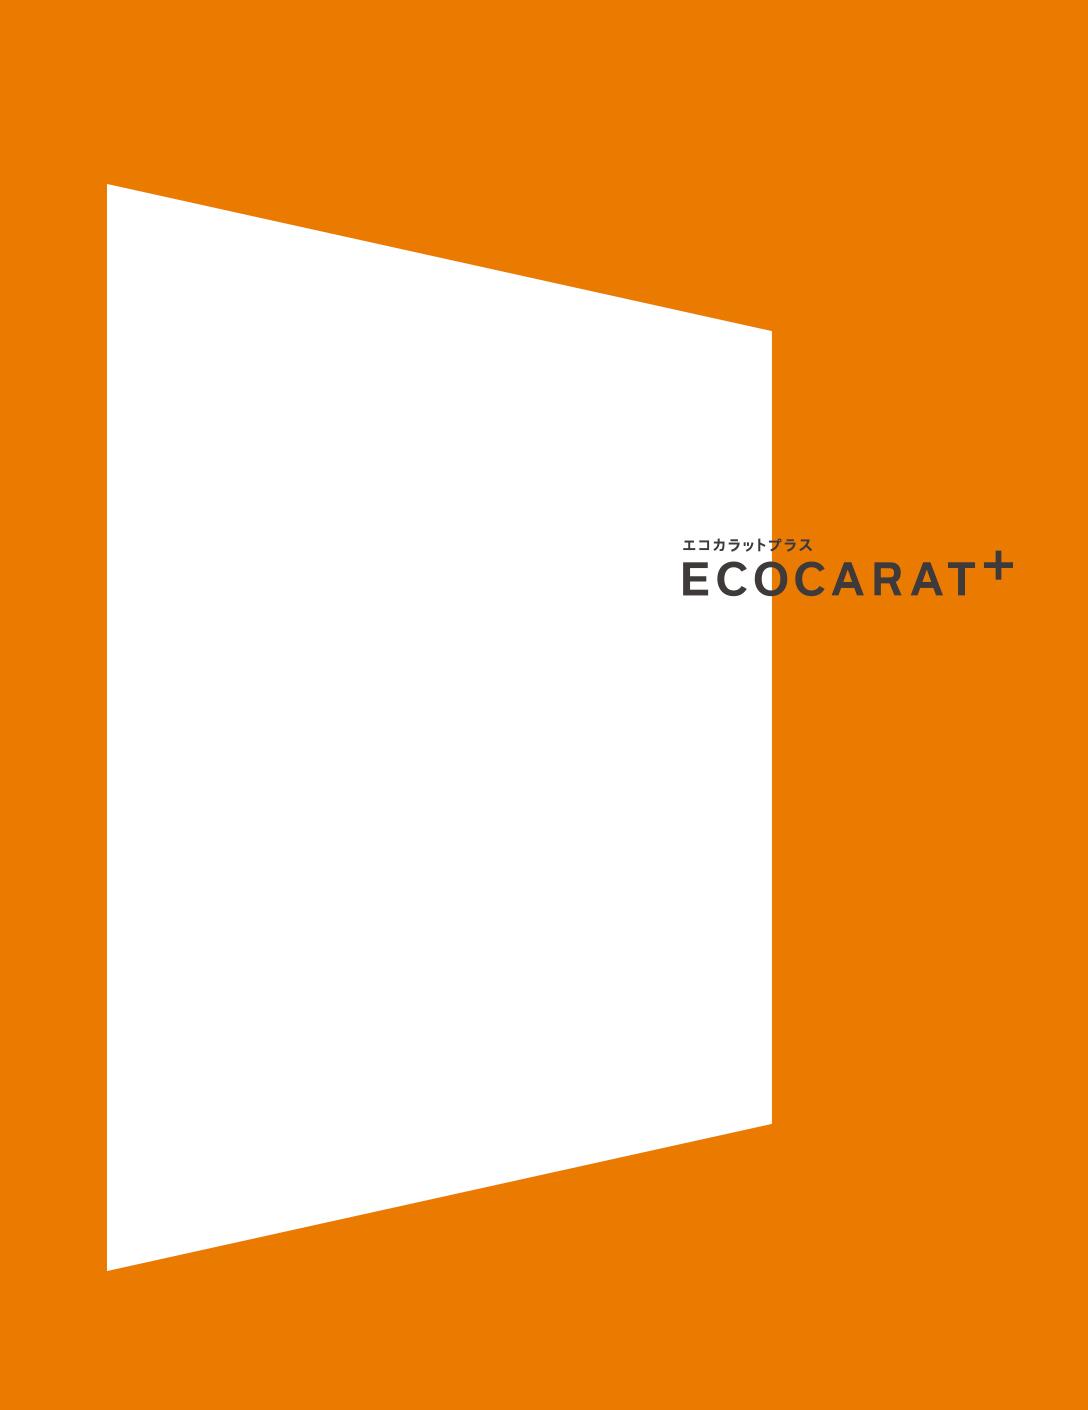 ECOCARAT+